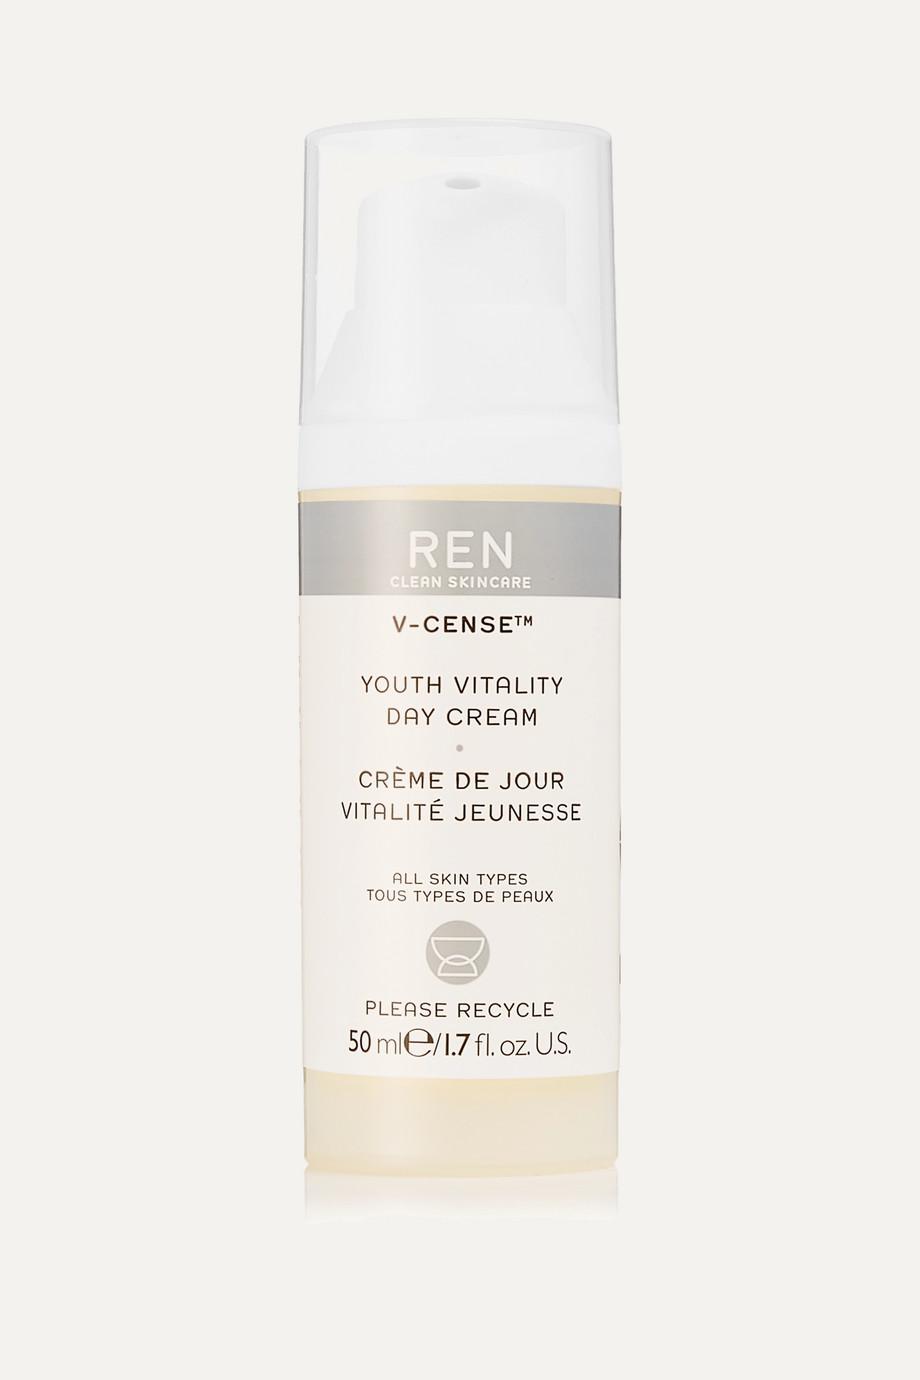 REN Clean Skincare V-Cense™ Youth Vitality Day Cream, 50ml